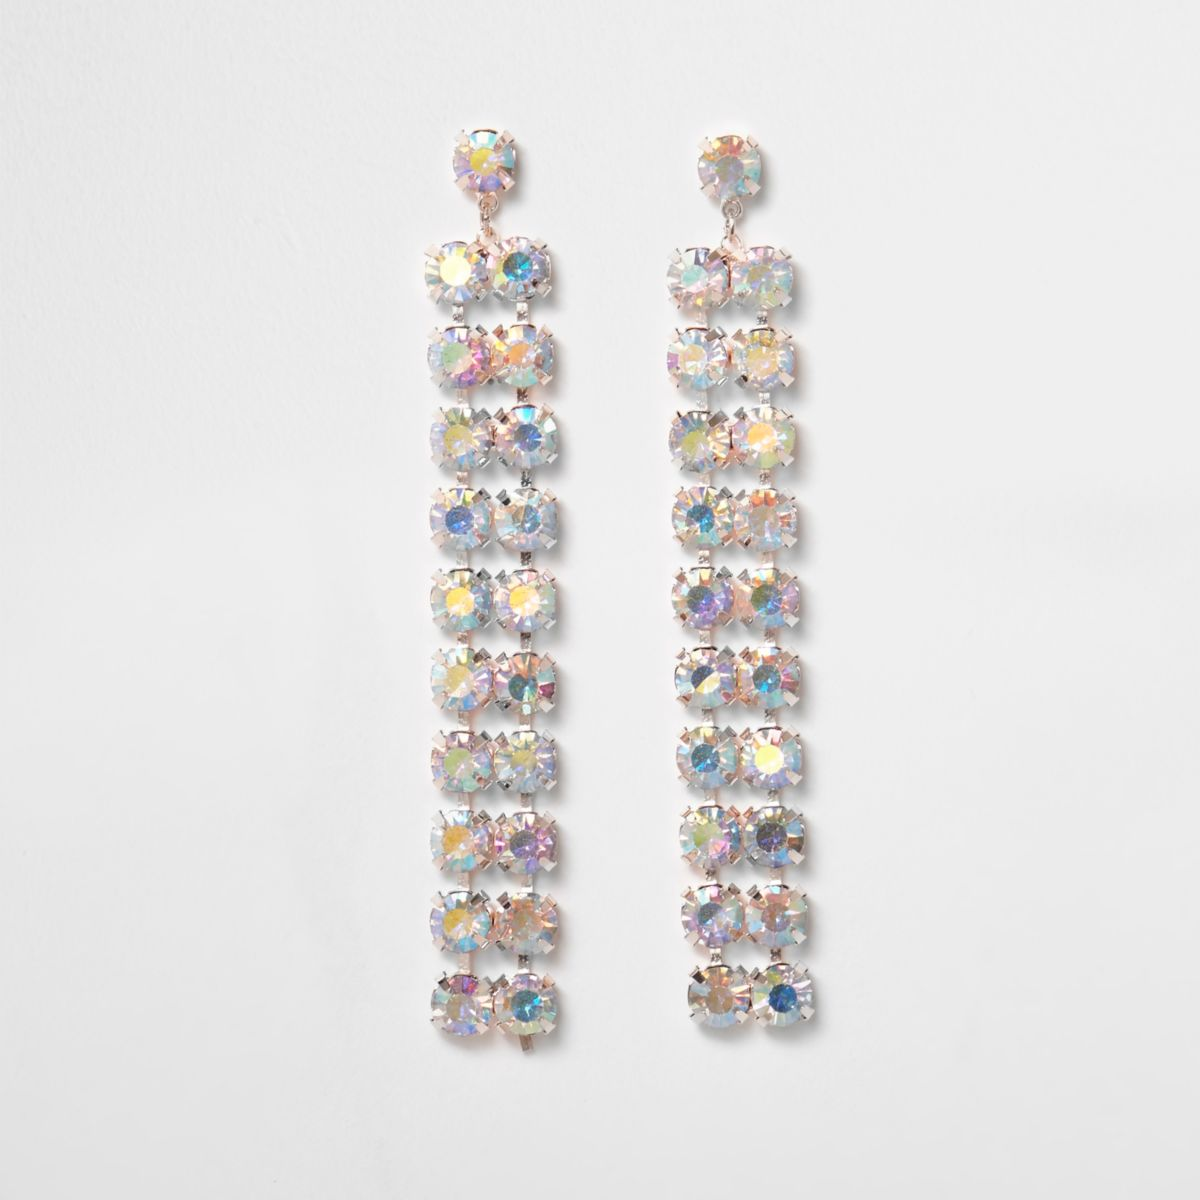 Rose gold tone rhinestone drop earrings